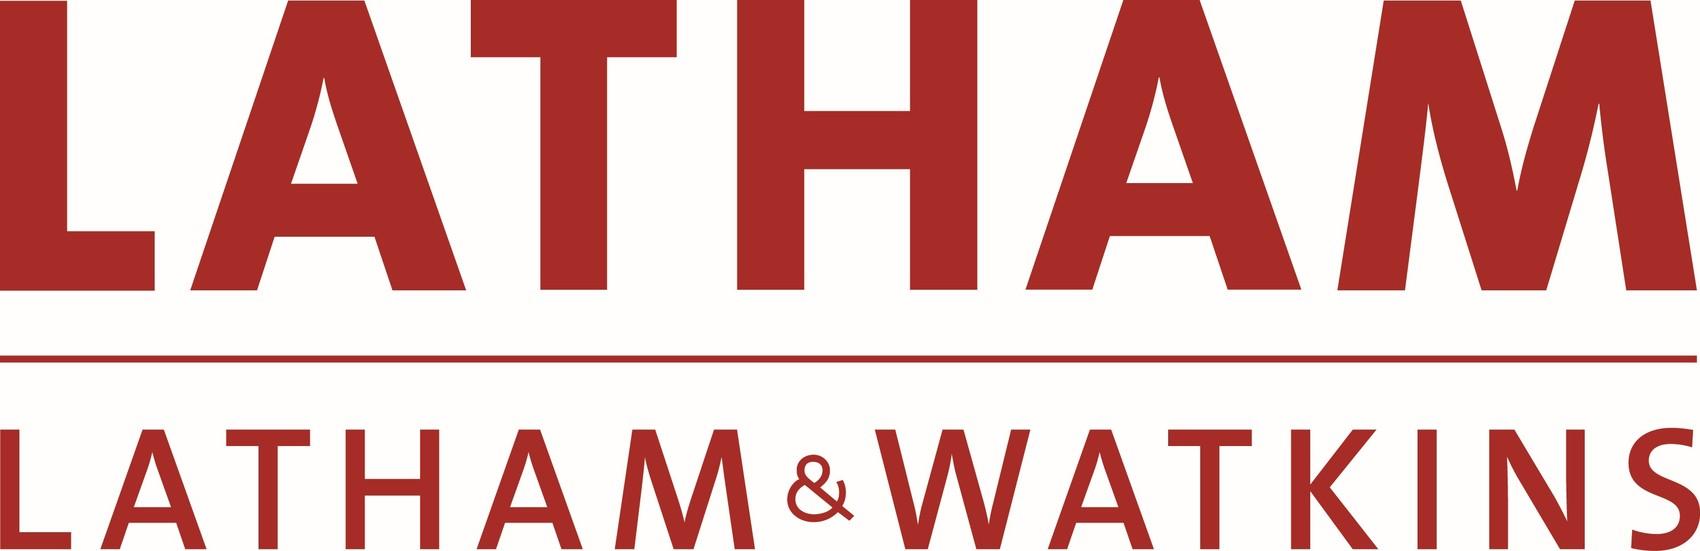 Latham&Watkins-logo-transparent